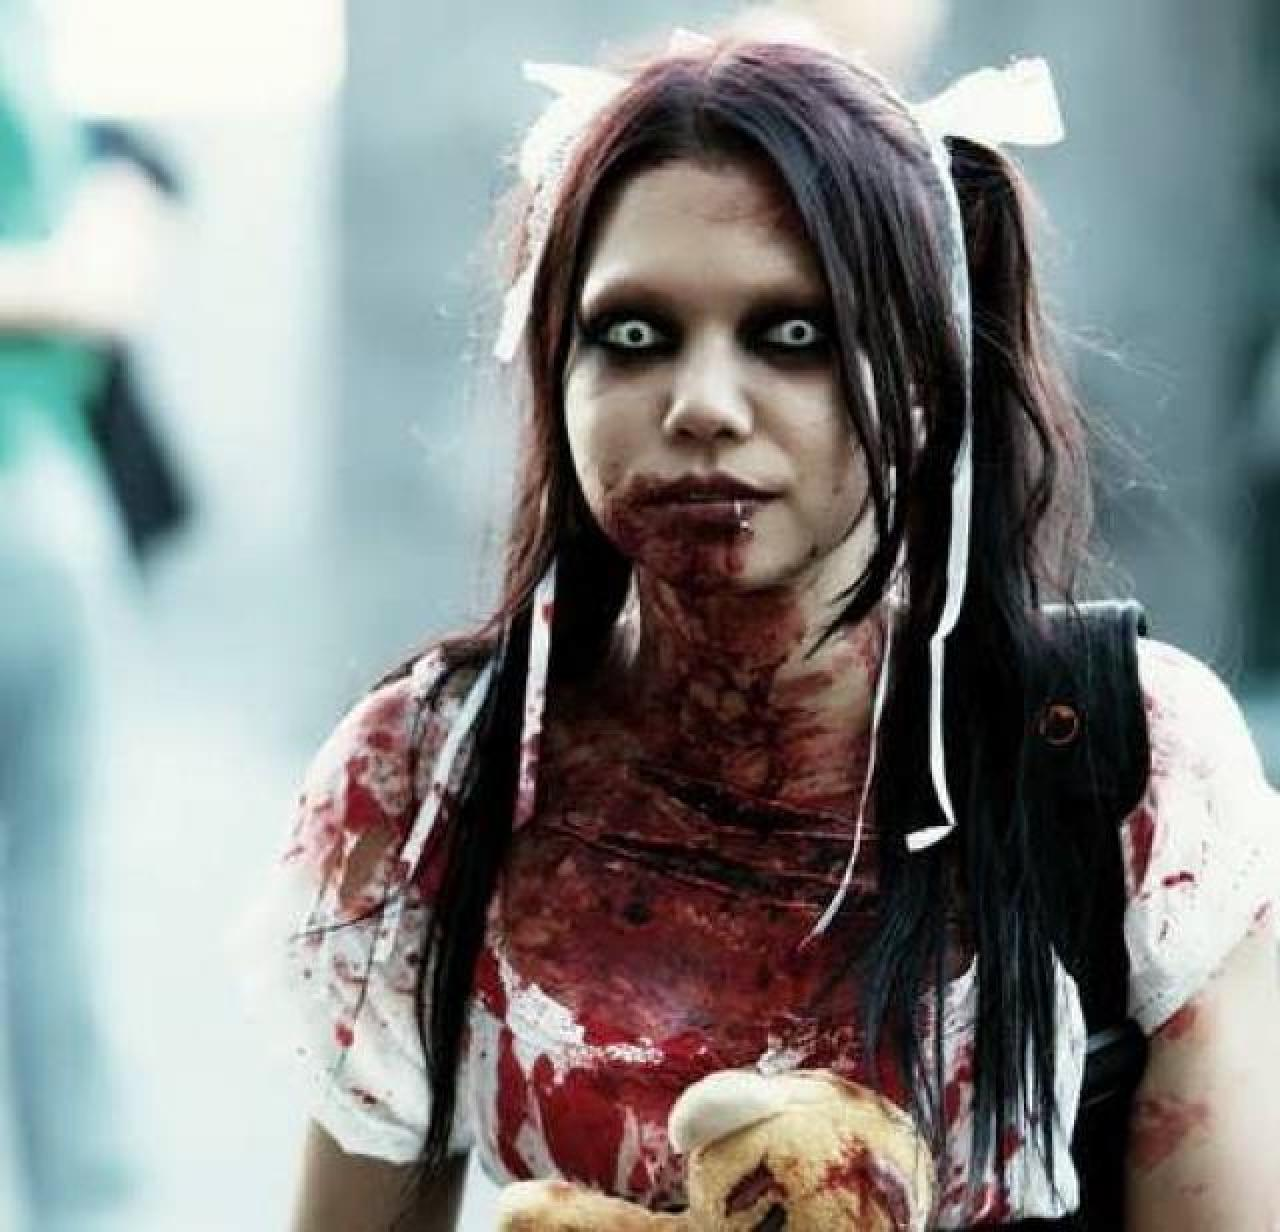 Zombie girl nackt sexy galleries